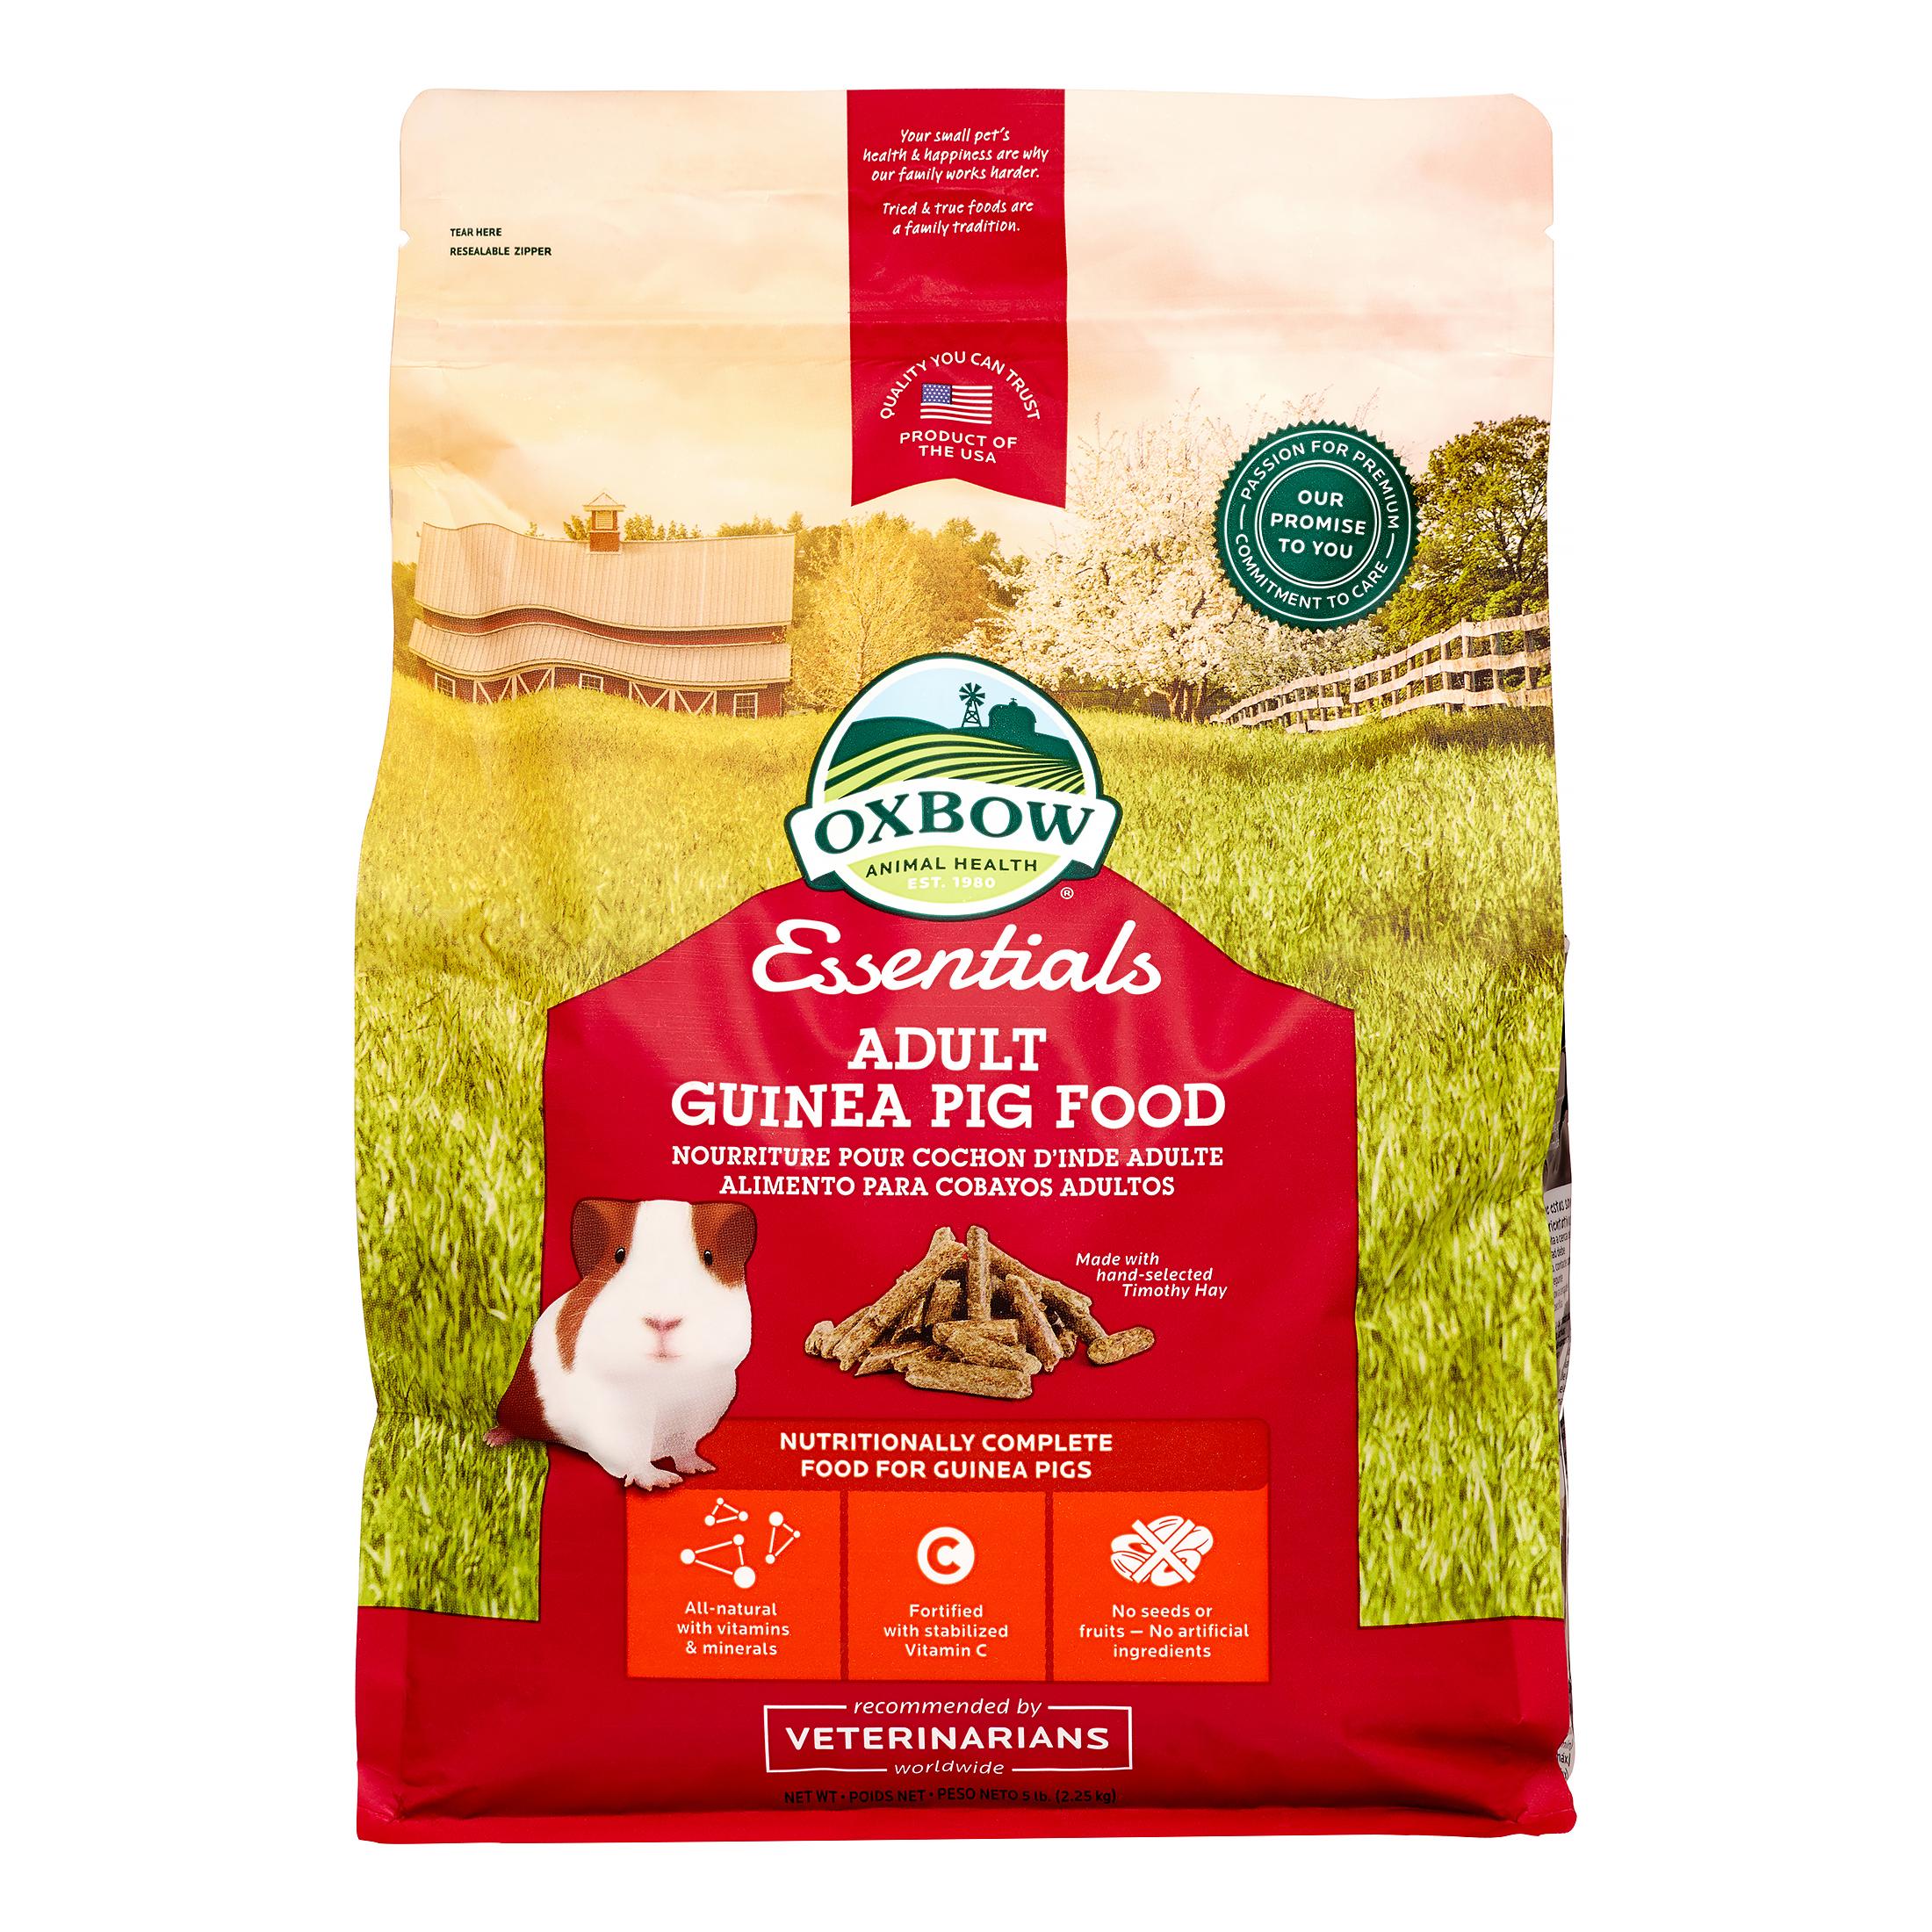 Oxbow Essentials Cavy Cuisine Adult Guinea Pig Dry Food, 5 lbs.